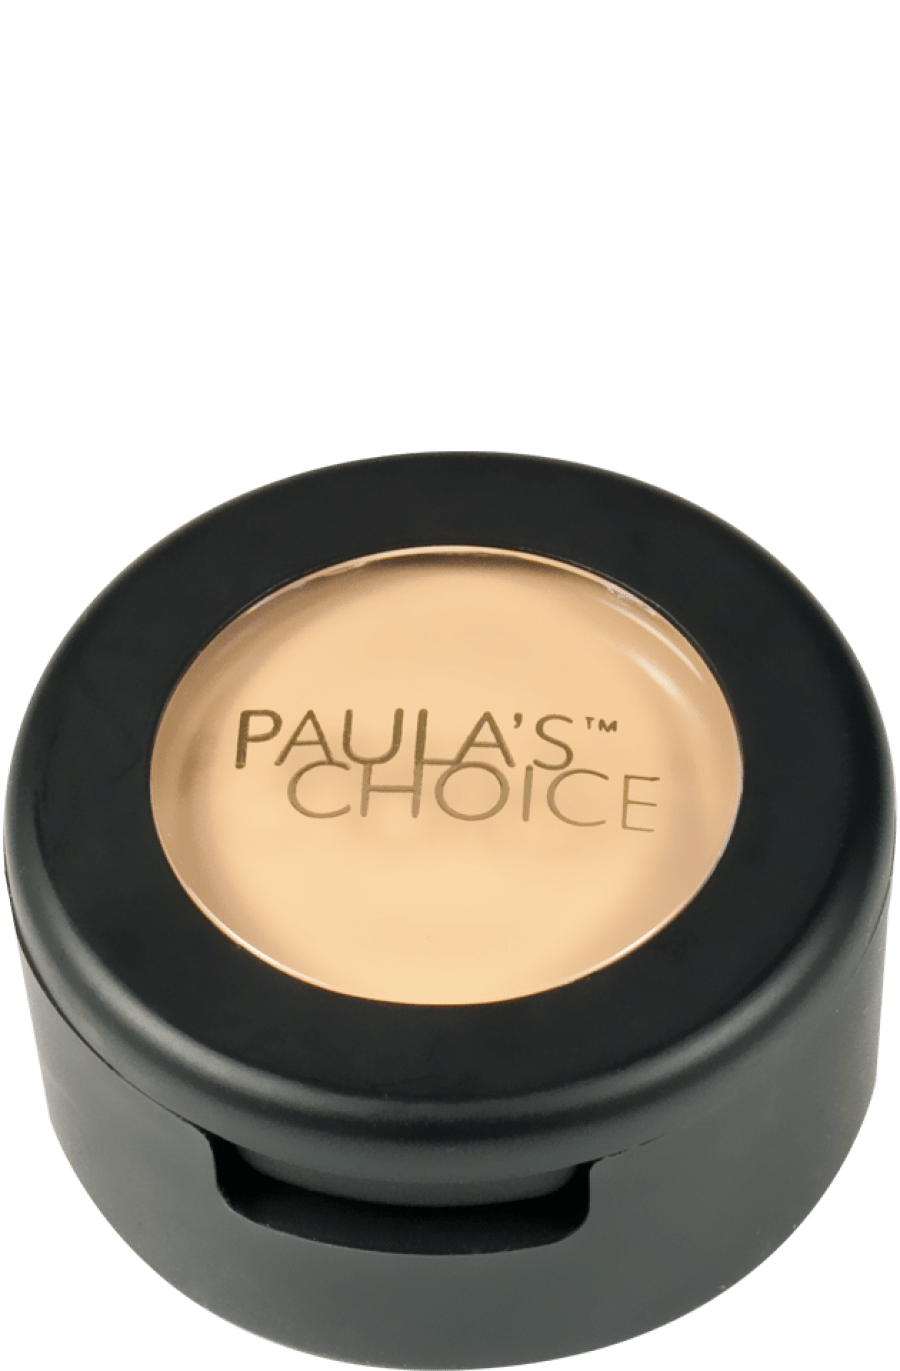 PaulasChoice_Soft Cream Concealer